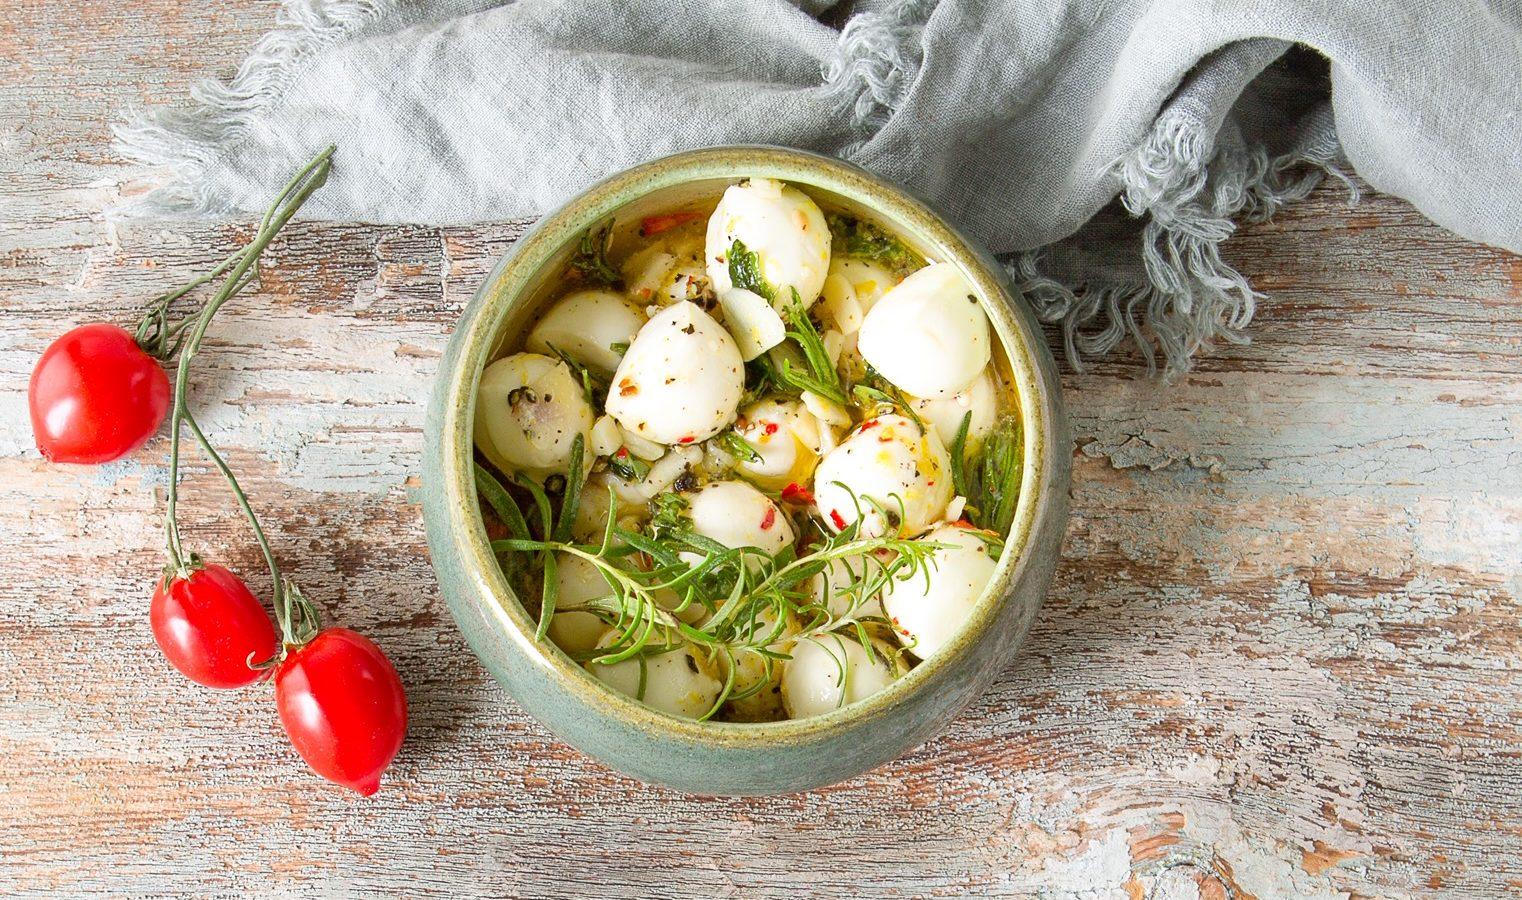 marinated mozzarella balls in a bowl with fresh veggies